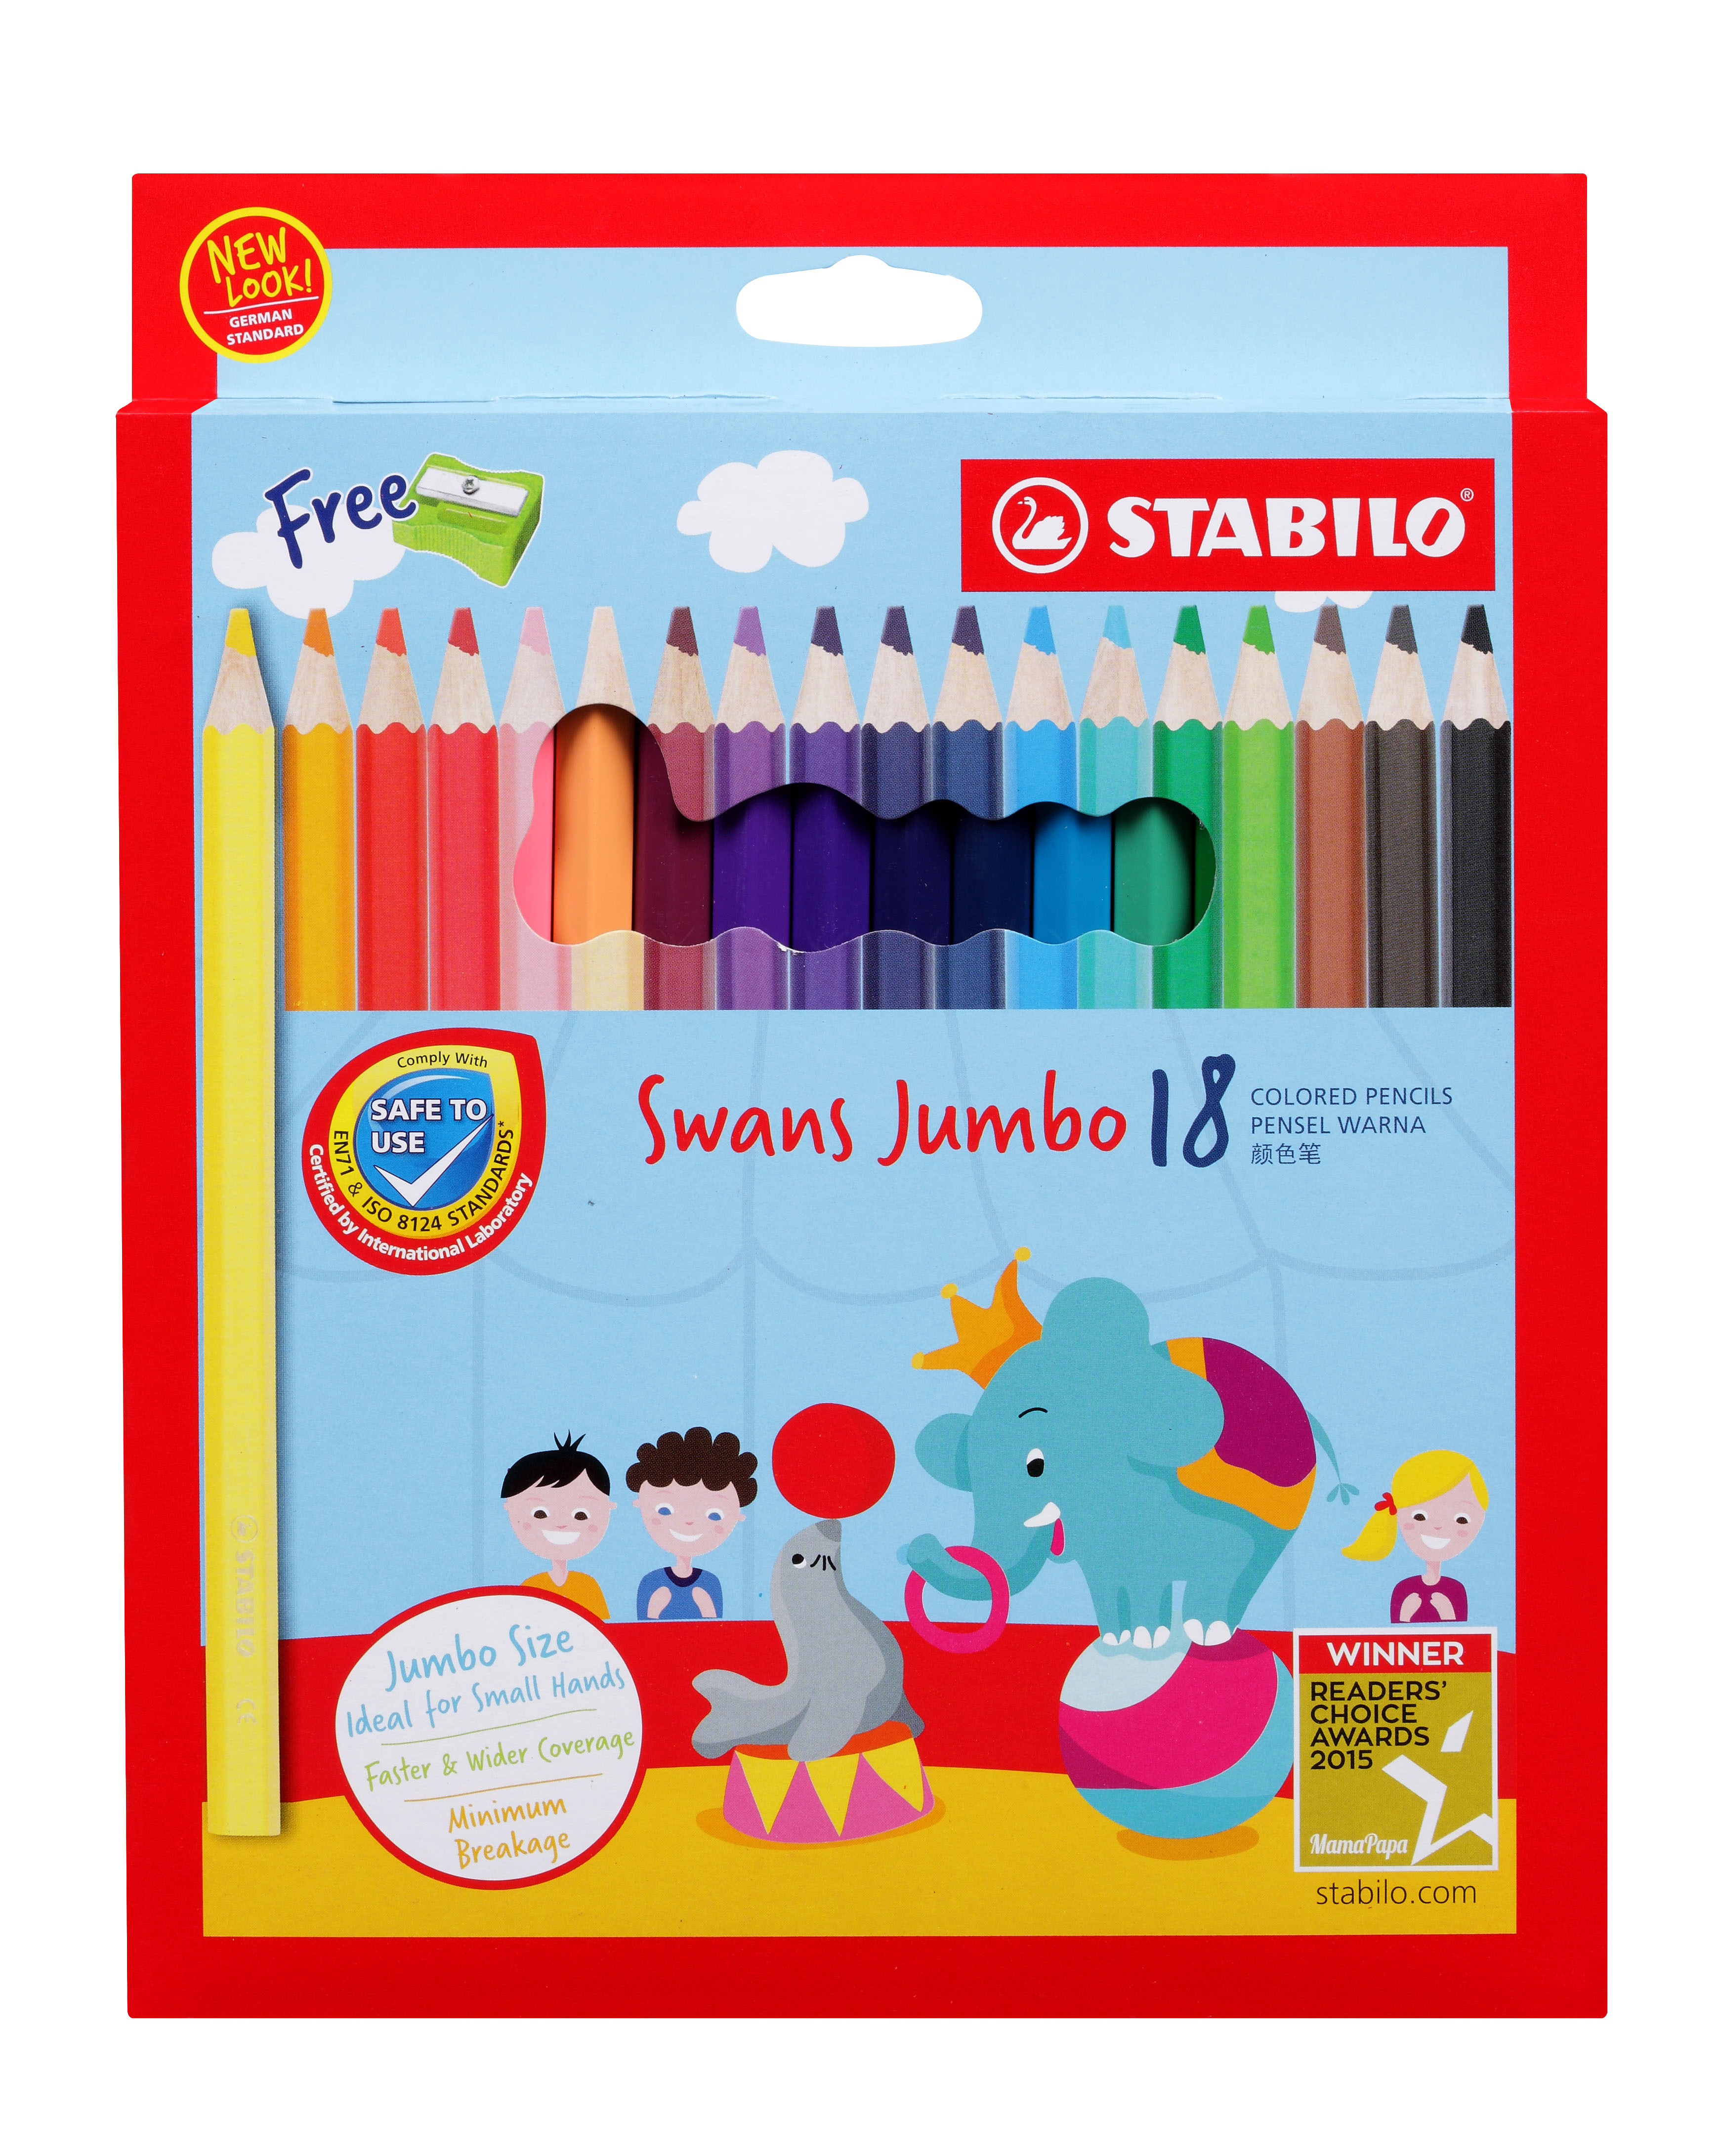 STABILO Swans Jumbo Colored Pencils